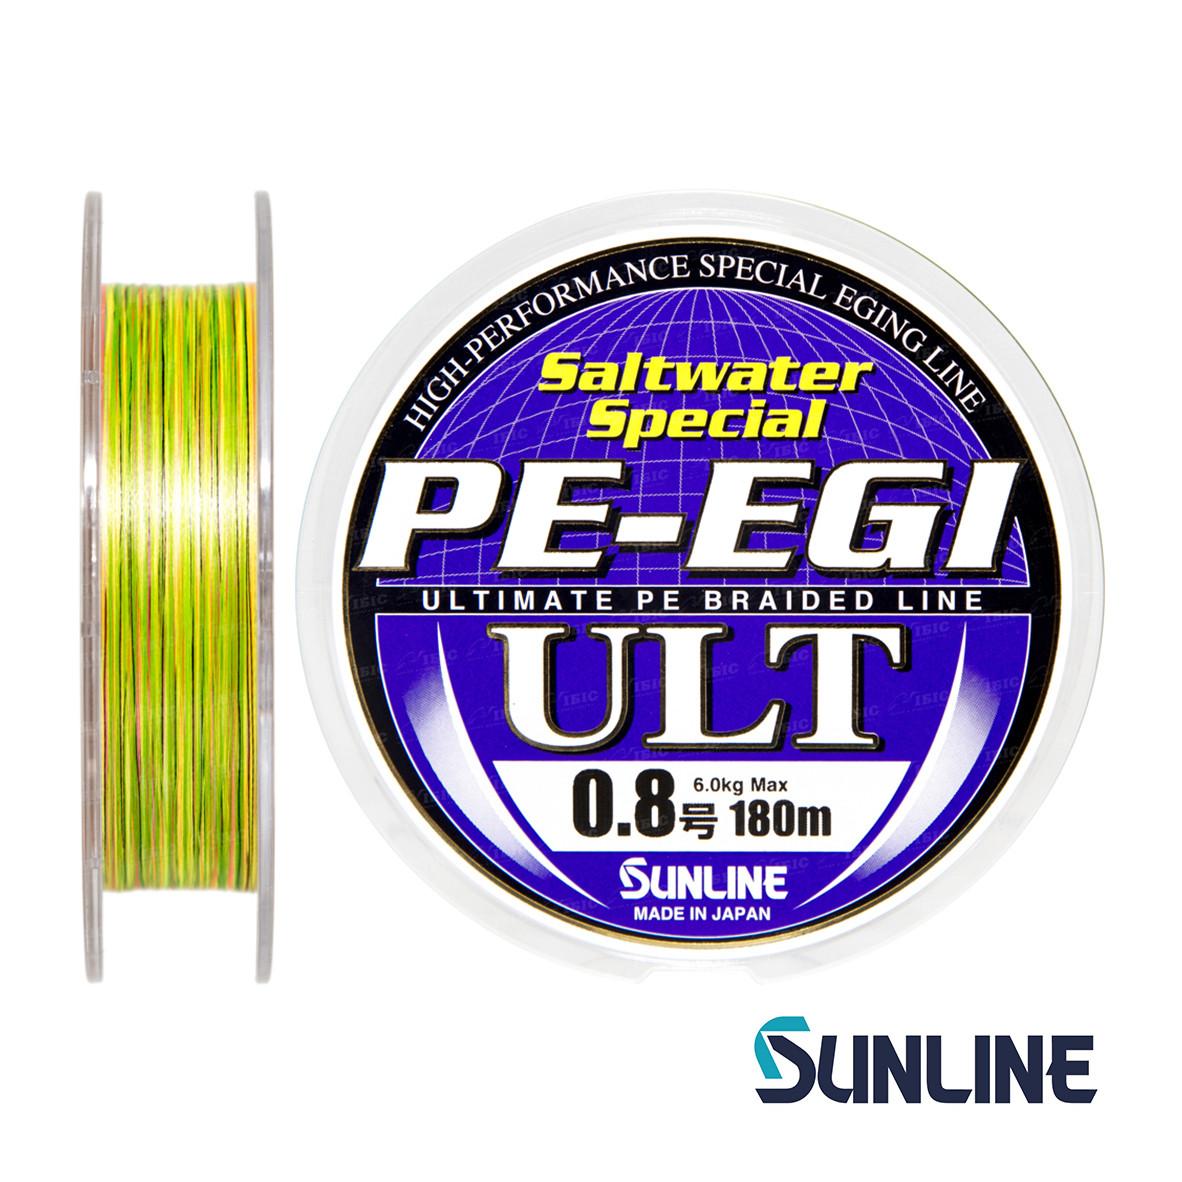 Шнур Sunline PE-EGI ULT 180m #0.3/0.09мм 2.5кг